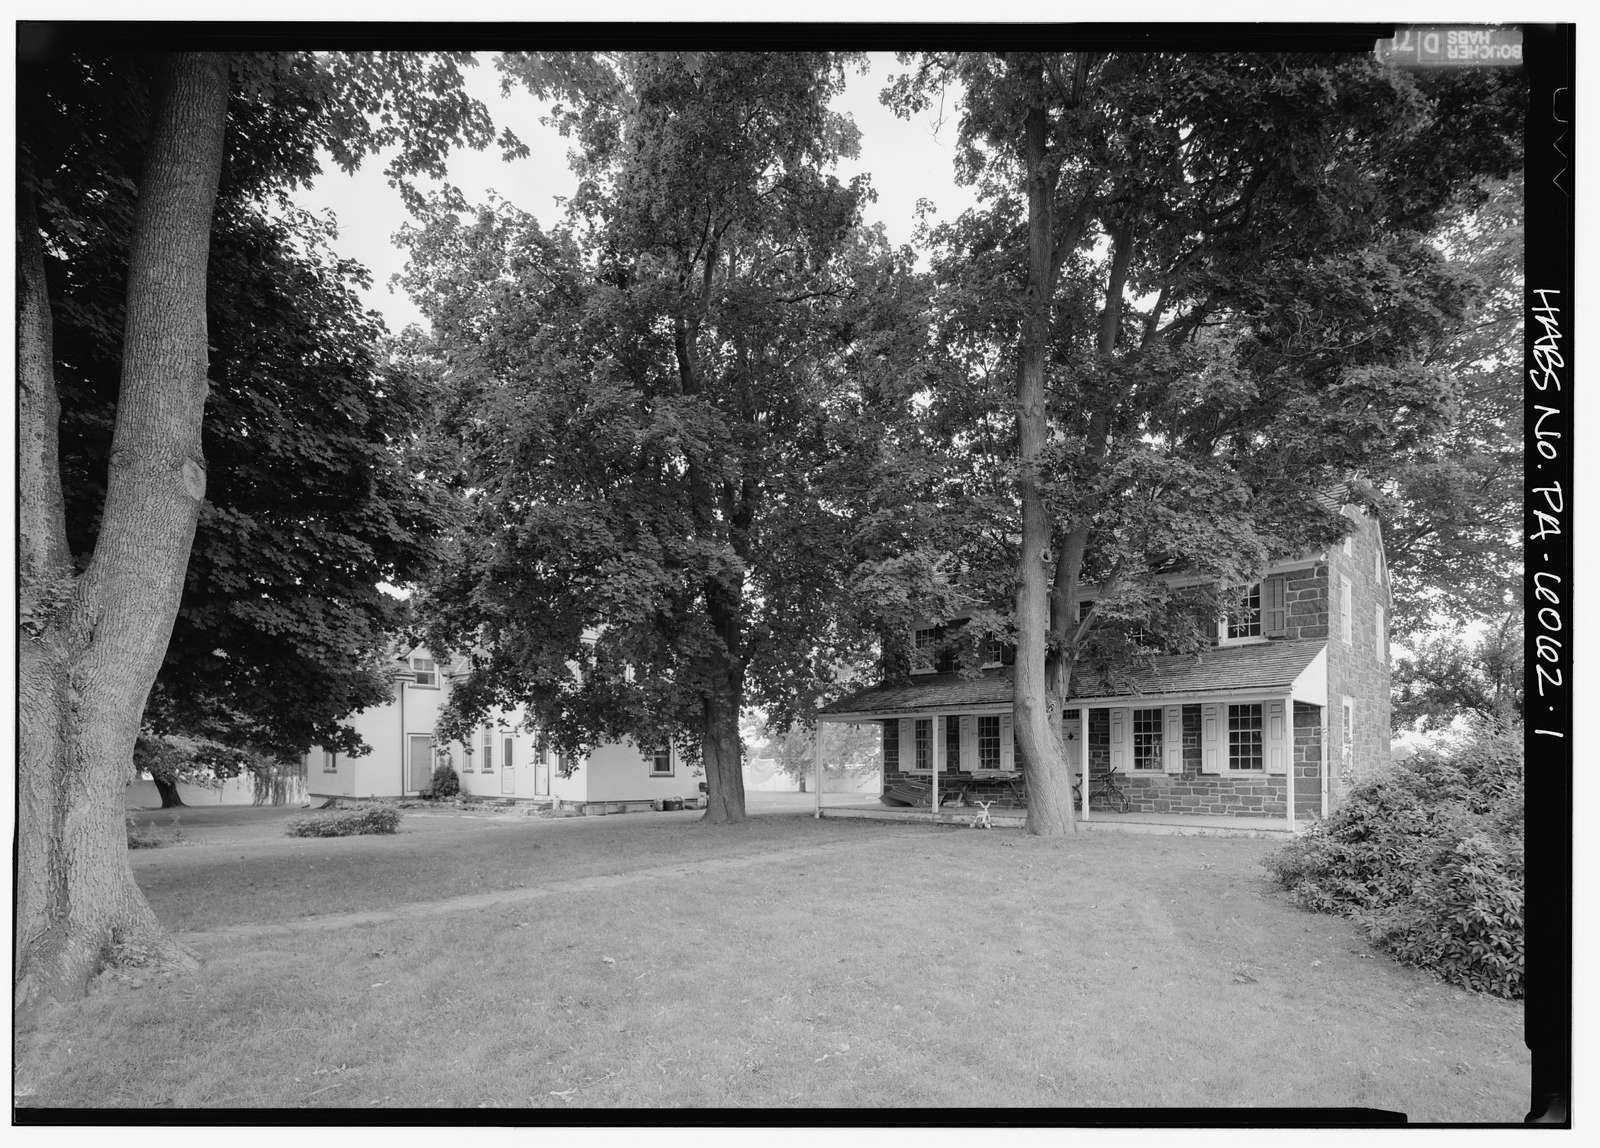 Normandy Farm, Morris & DeKalb Roads, Franklinville, Montgomery County, PA